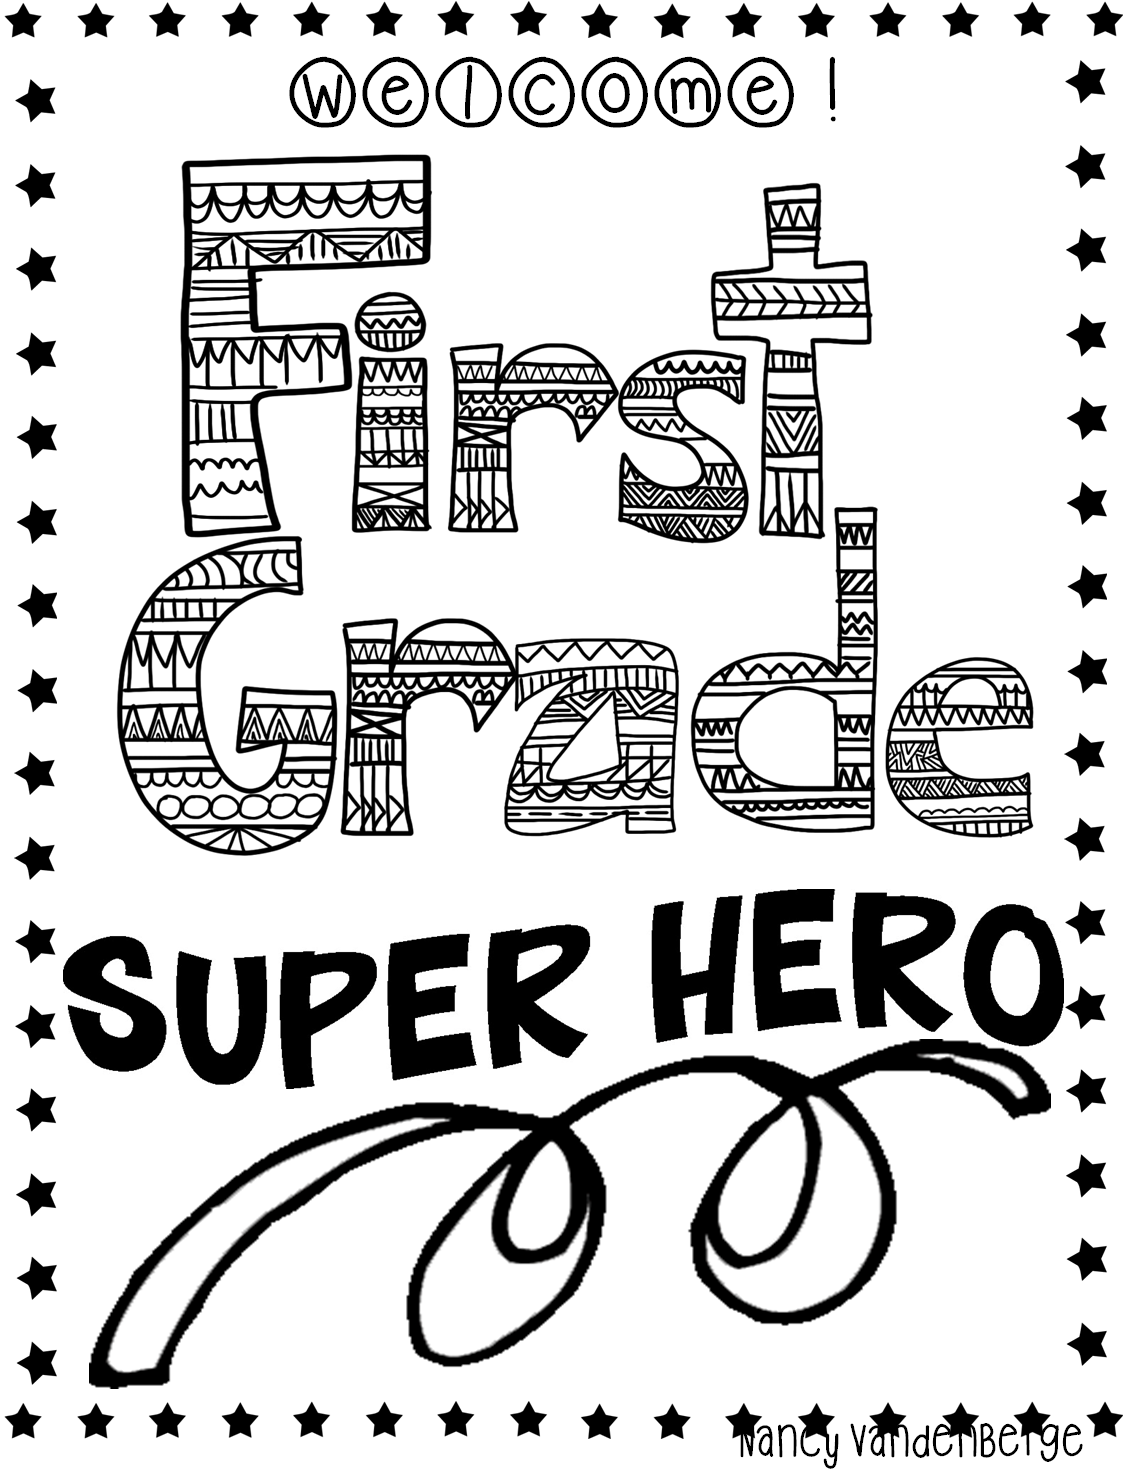 Superhero Unit To The Rescue